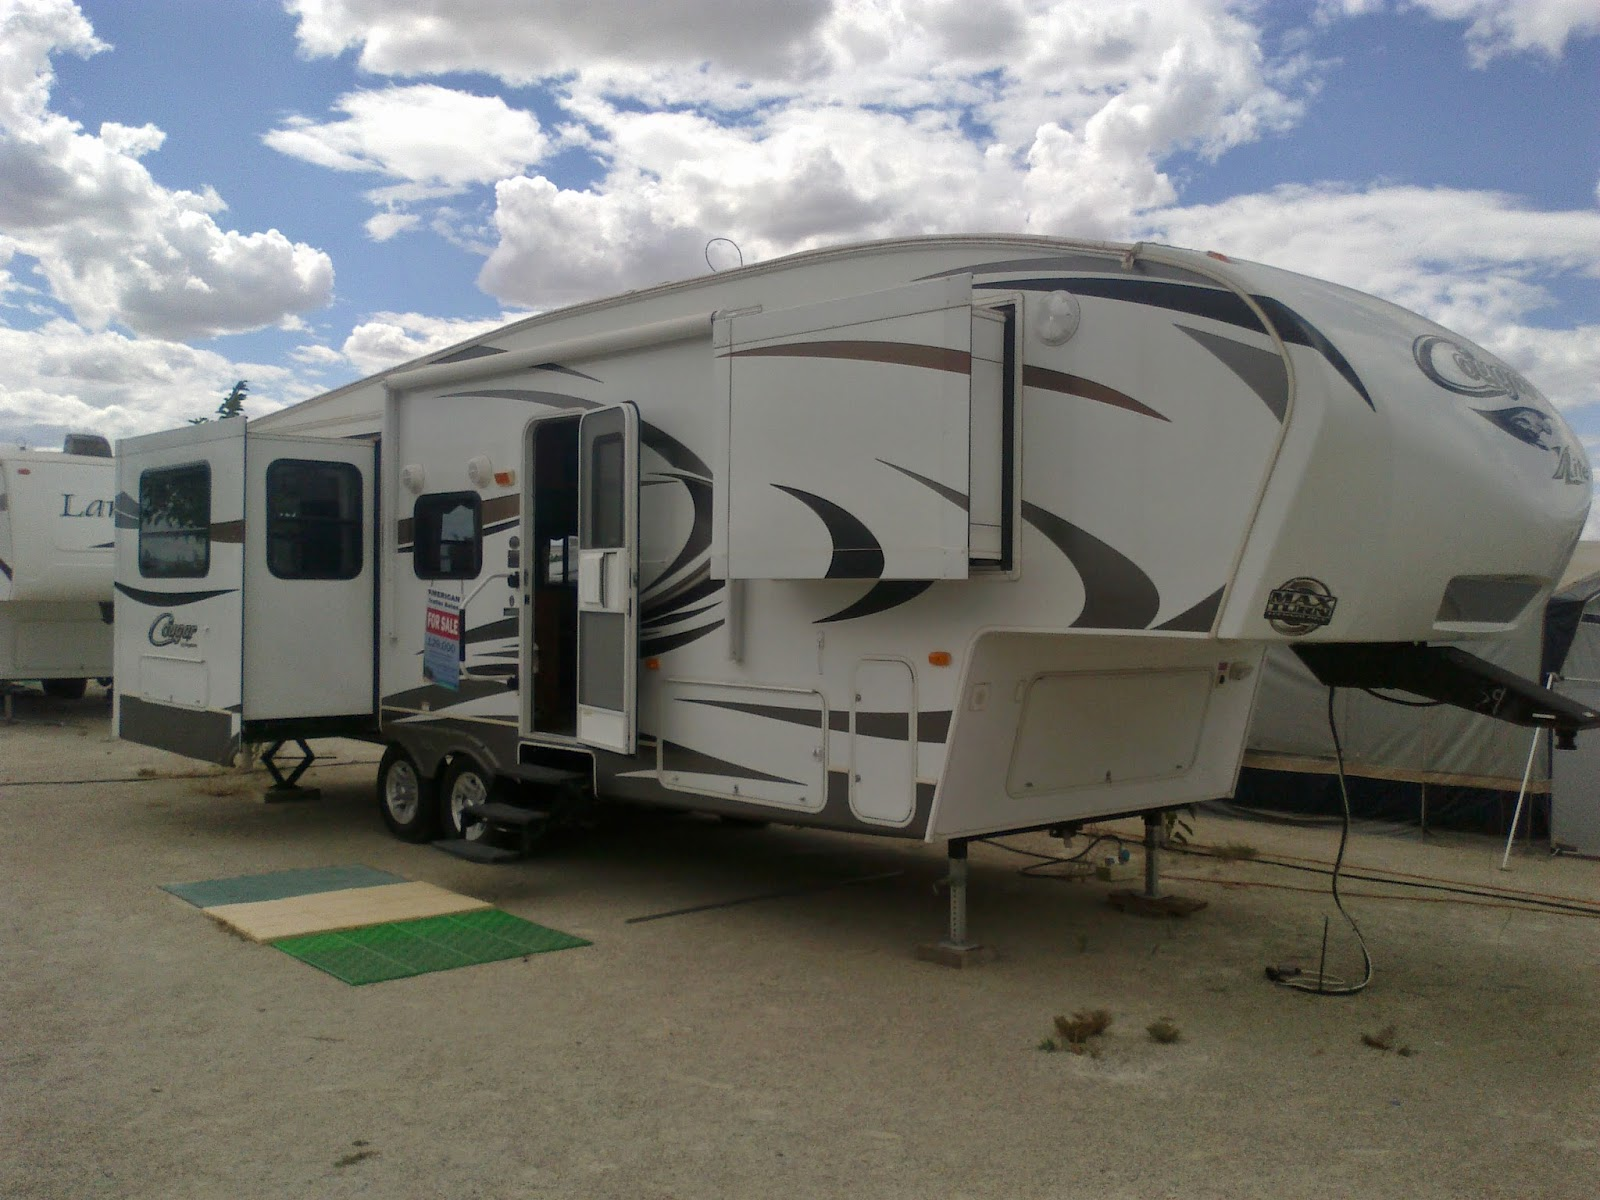 american rv 5th wheel caravan and travel trailer sales. Black Bedroom Furniture Sets. Home Design Ideas